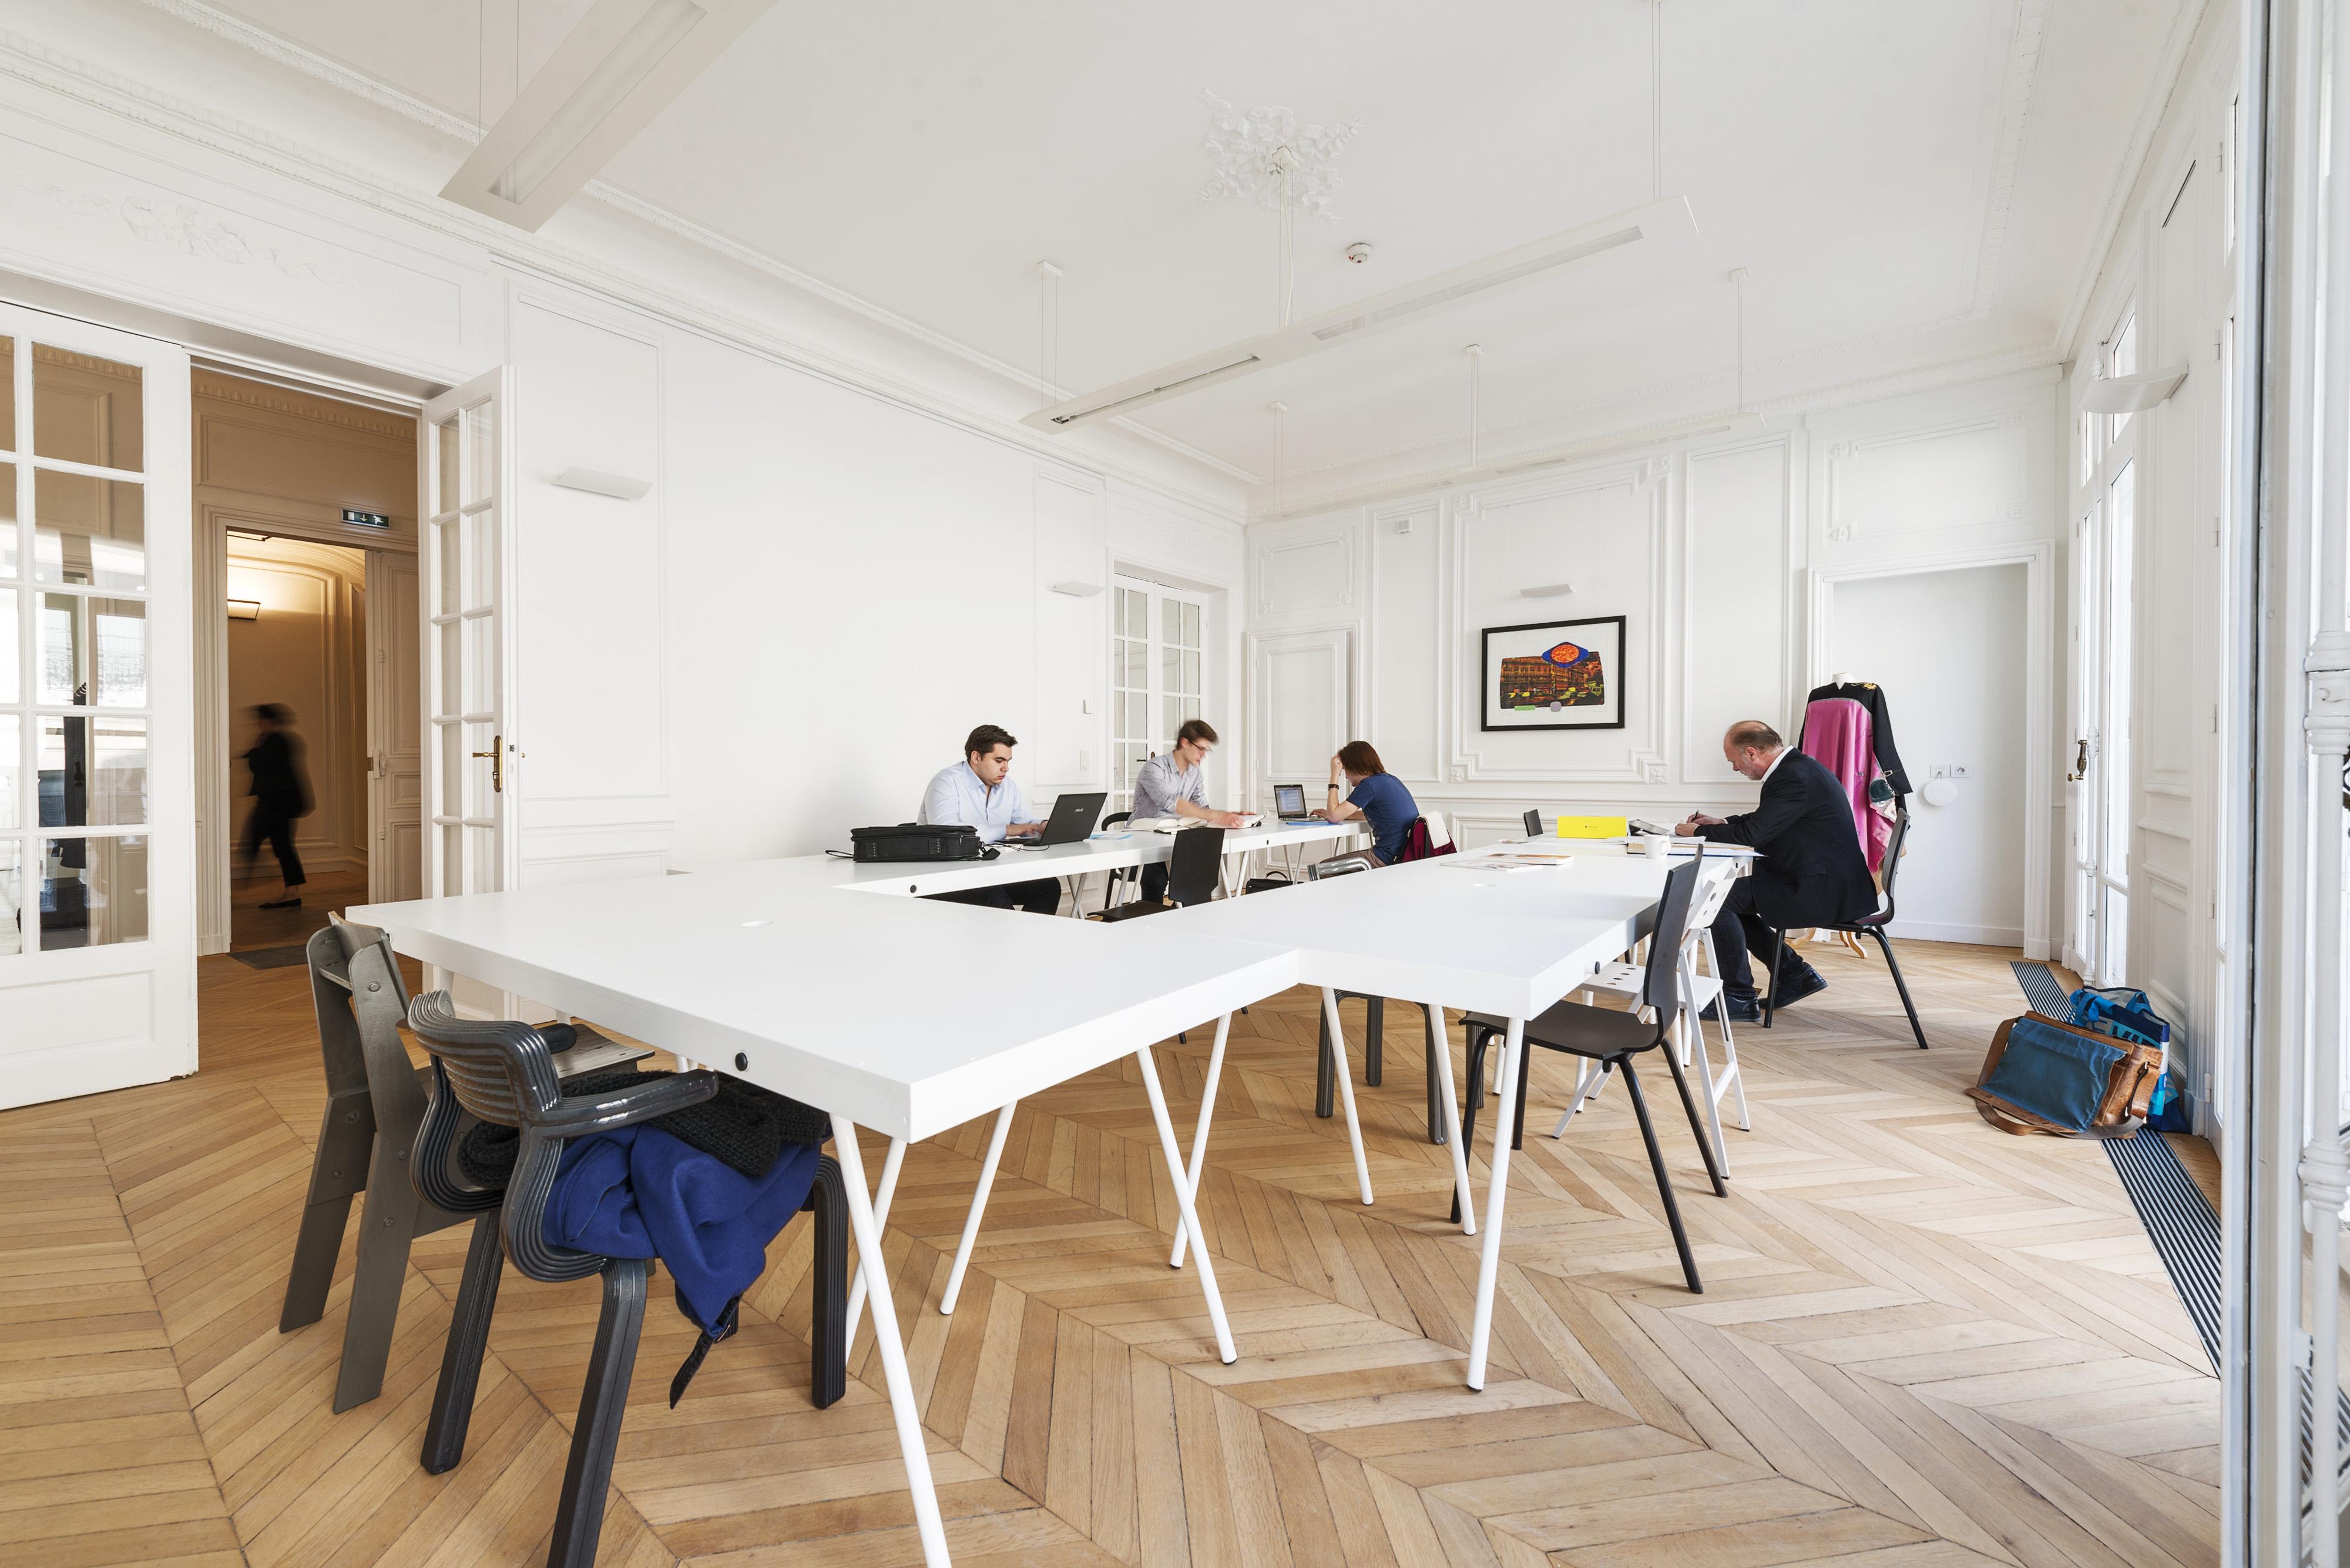 atelier ruimte 1 - 4